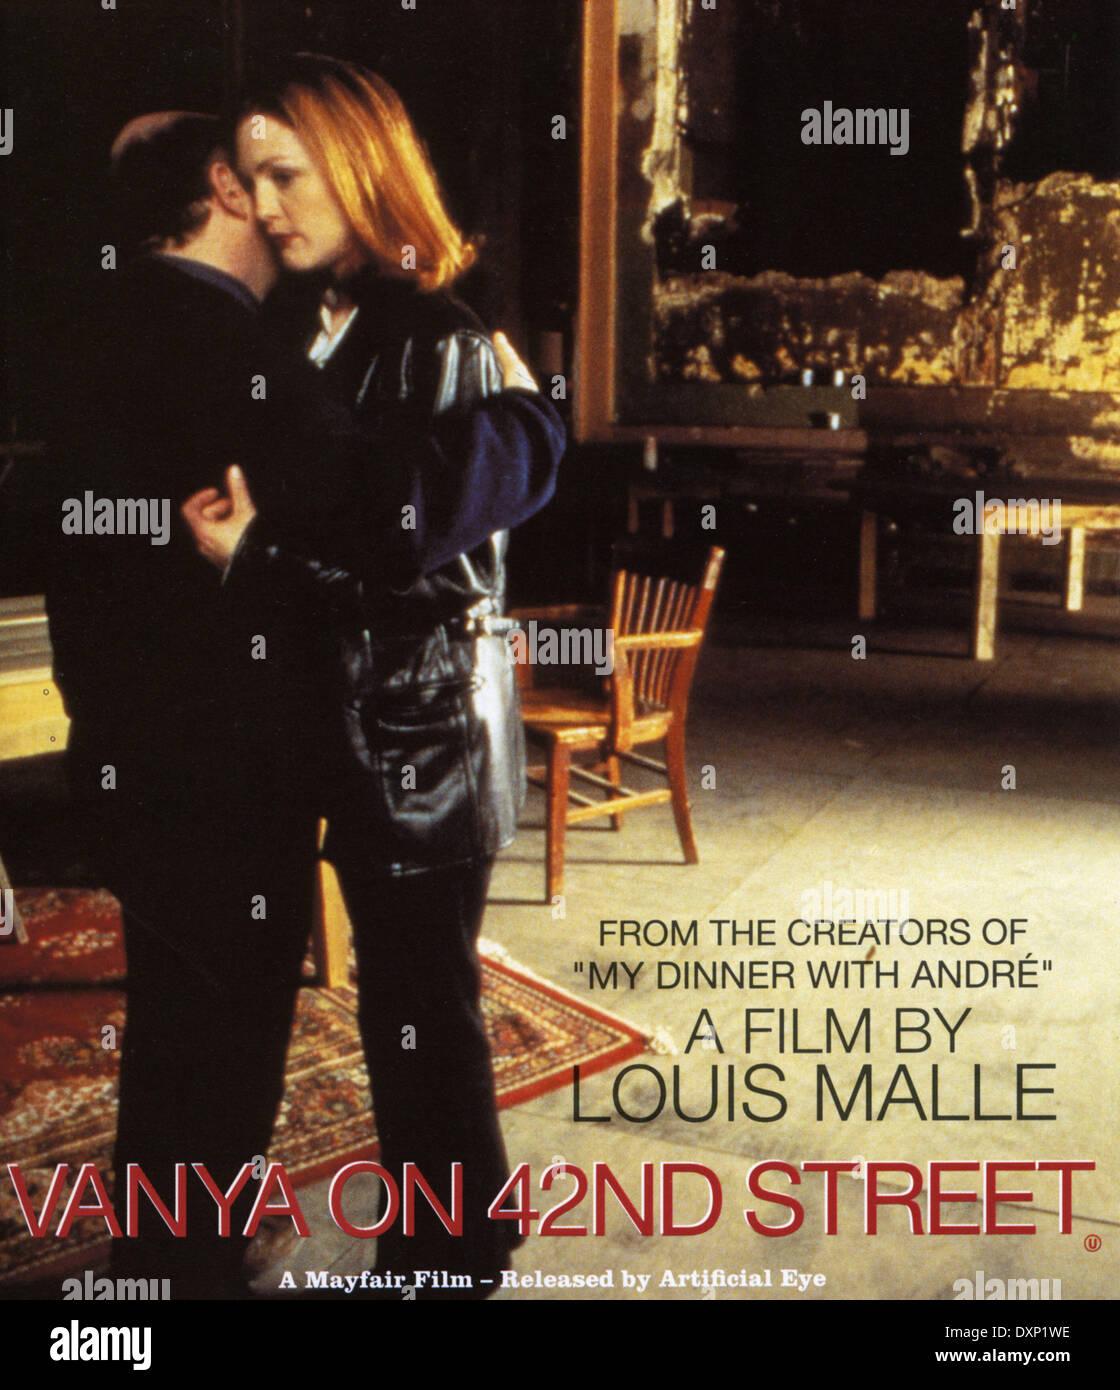 VANYA ON 42ND STREET - Stock Image